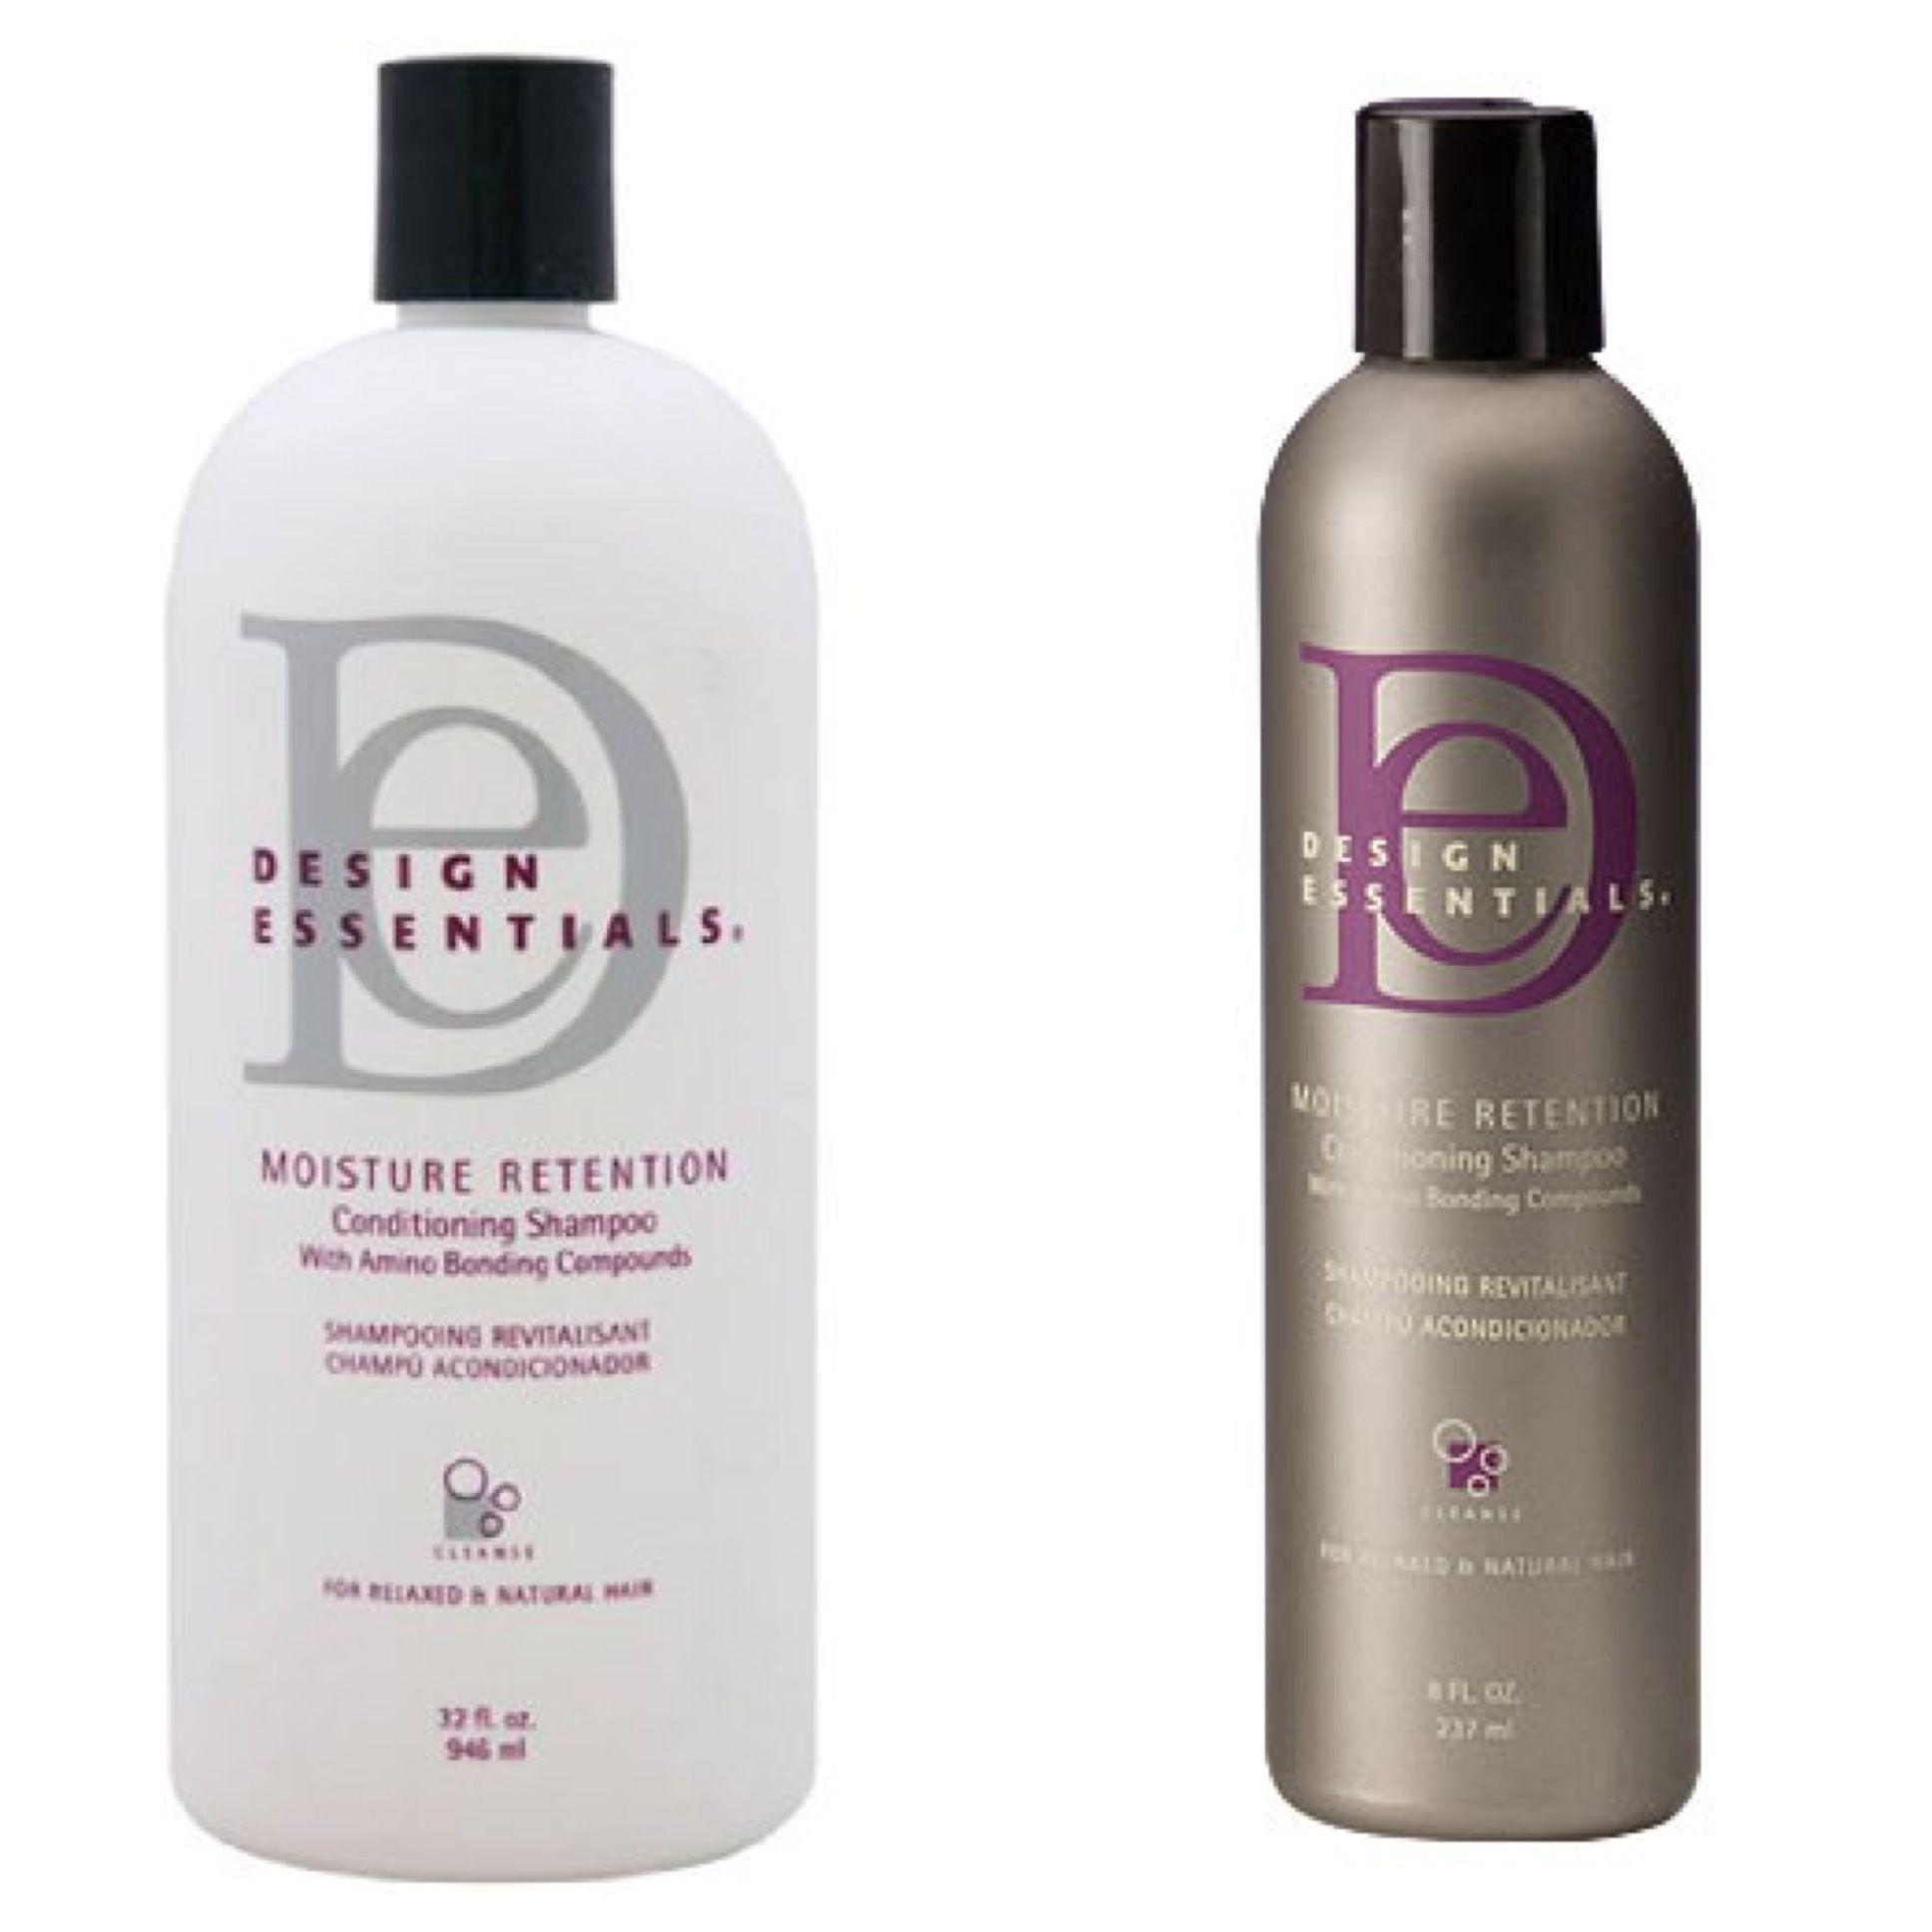 Design Essentials Moisture Retention Shampoo And Stimulations